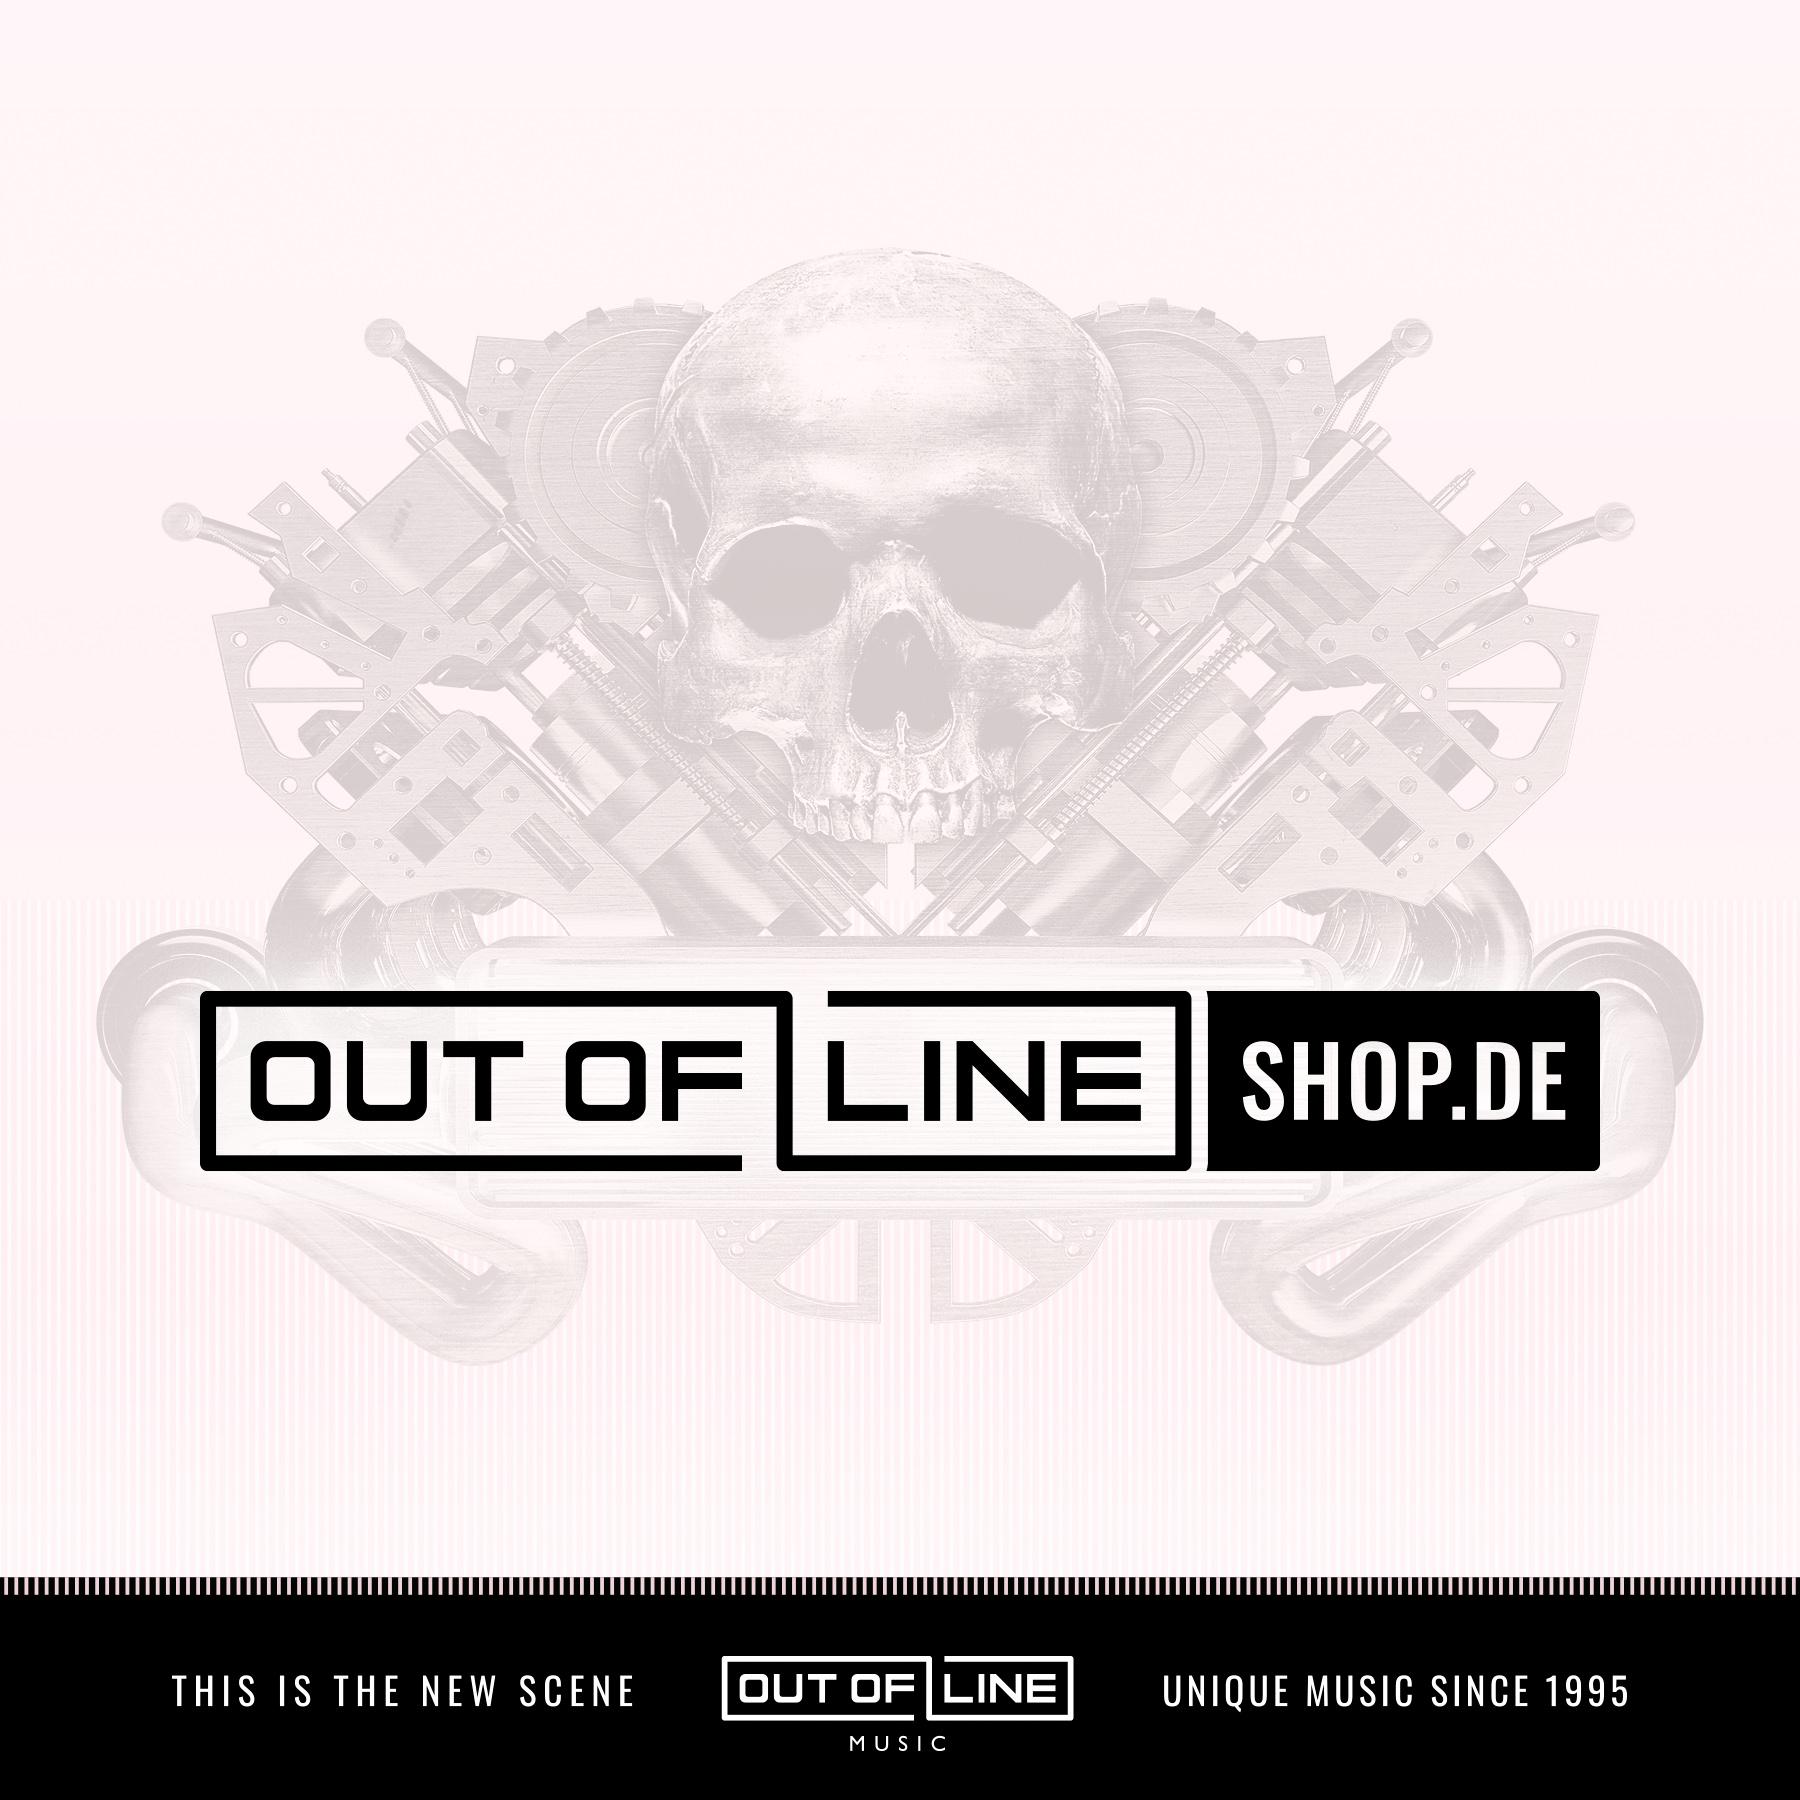 Kirlian Camera - Cold Pills (Scarlet Gate of Toxic Daybreak) - 2CD